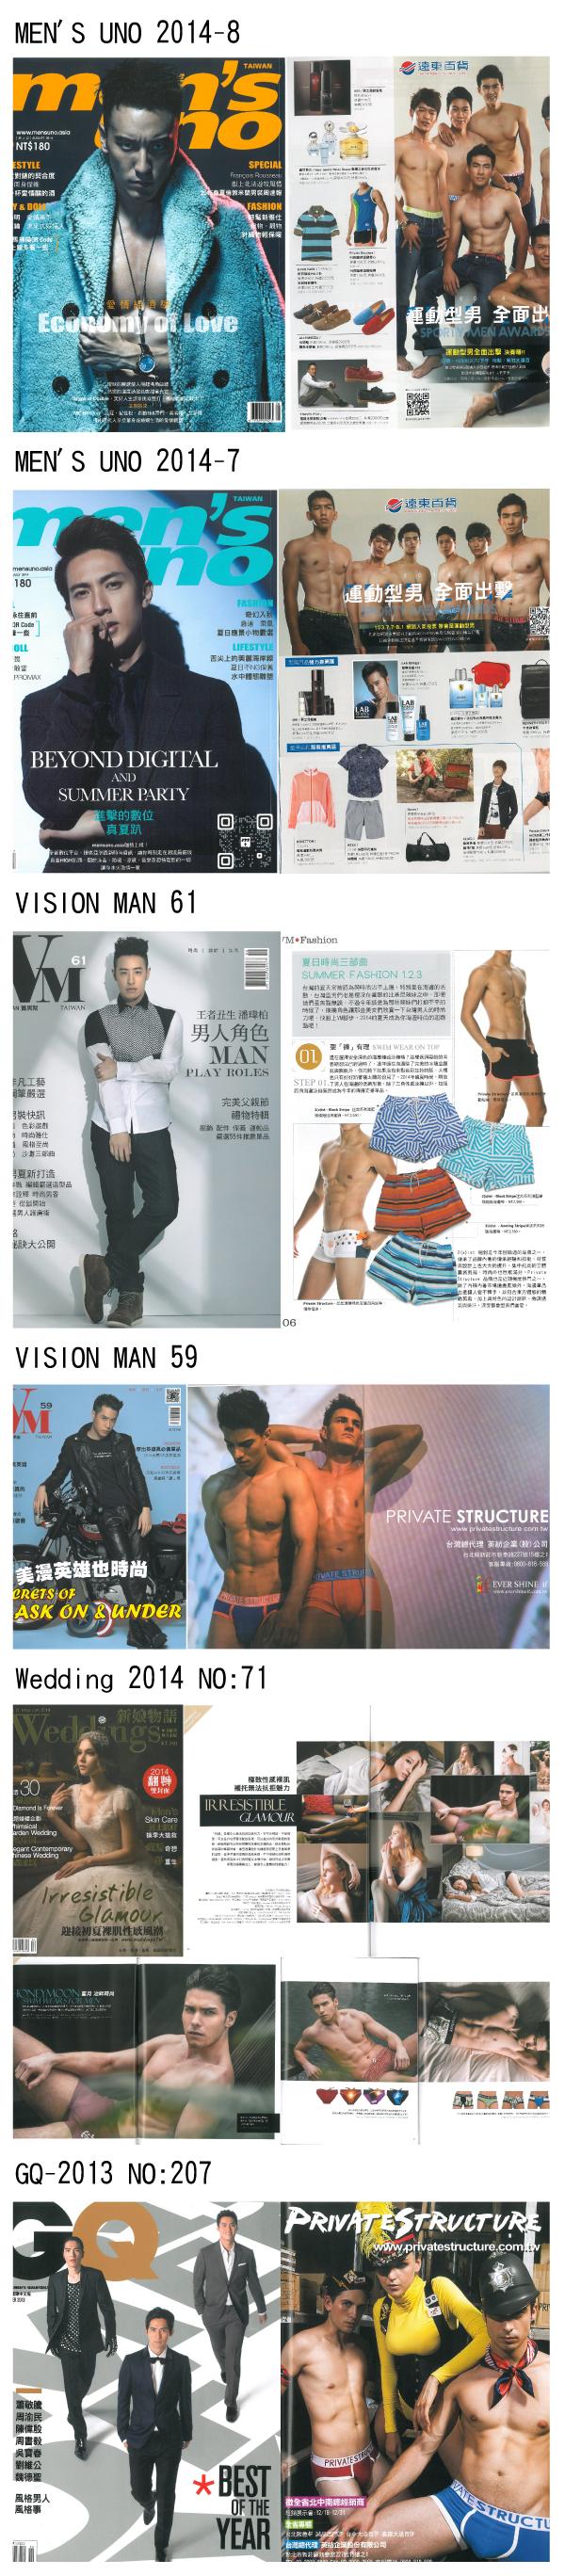 http://www.momoshop.com.tw/expertimg/0003/737/773/ps-magazine.jpg?t=1448901617